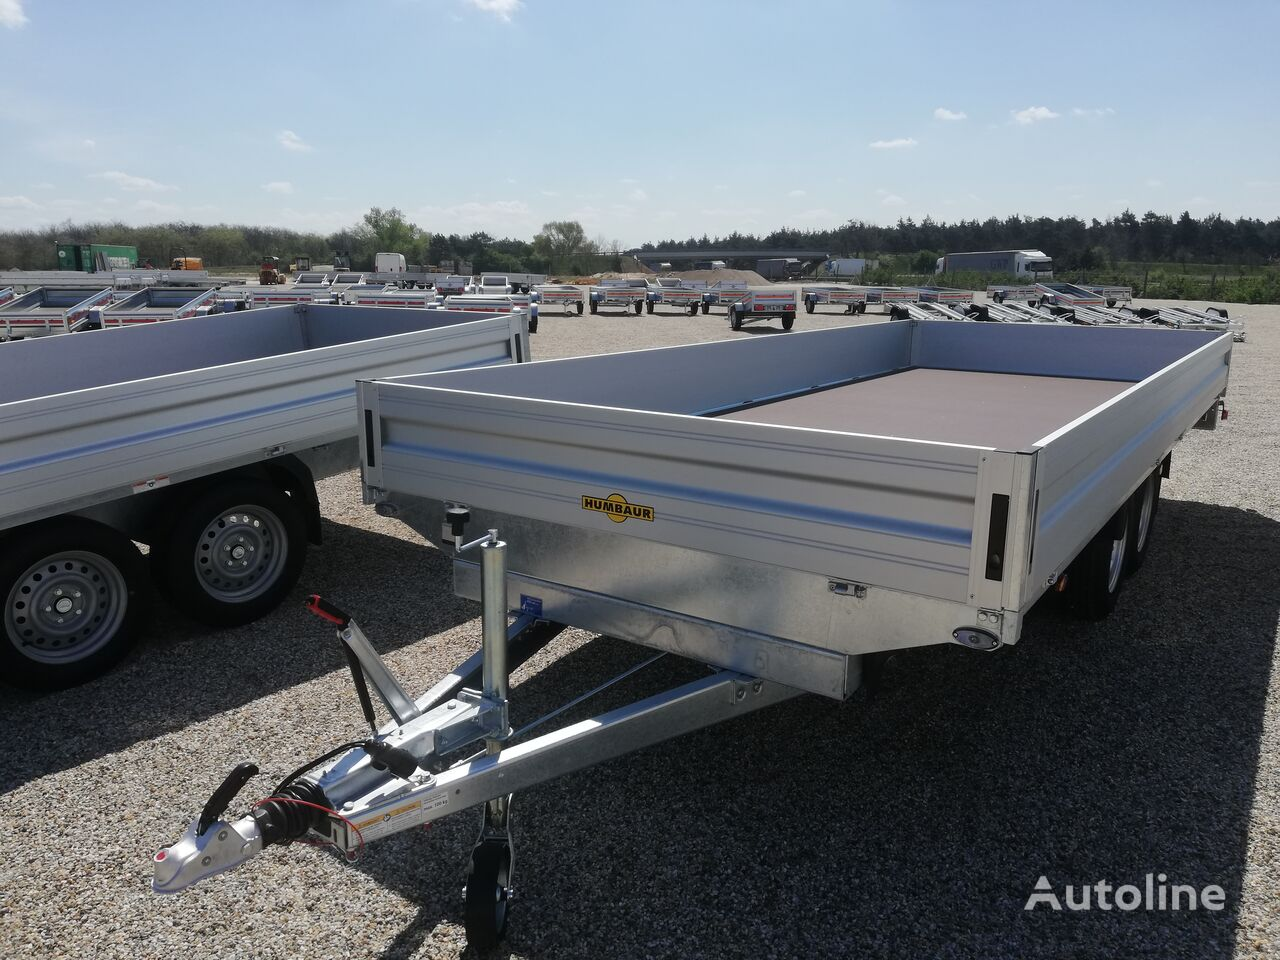 new HUMBAUR HT 355221 flatbed trailer